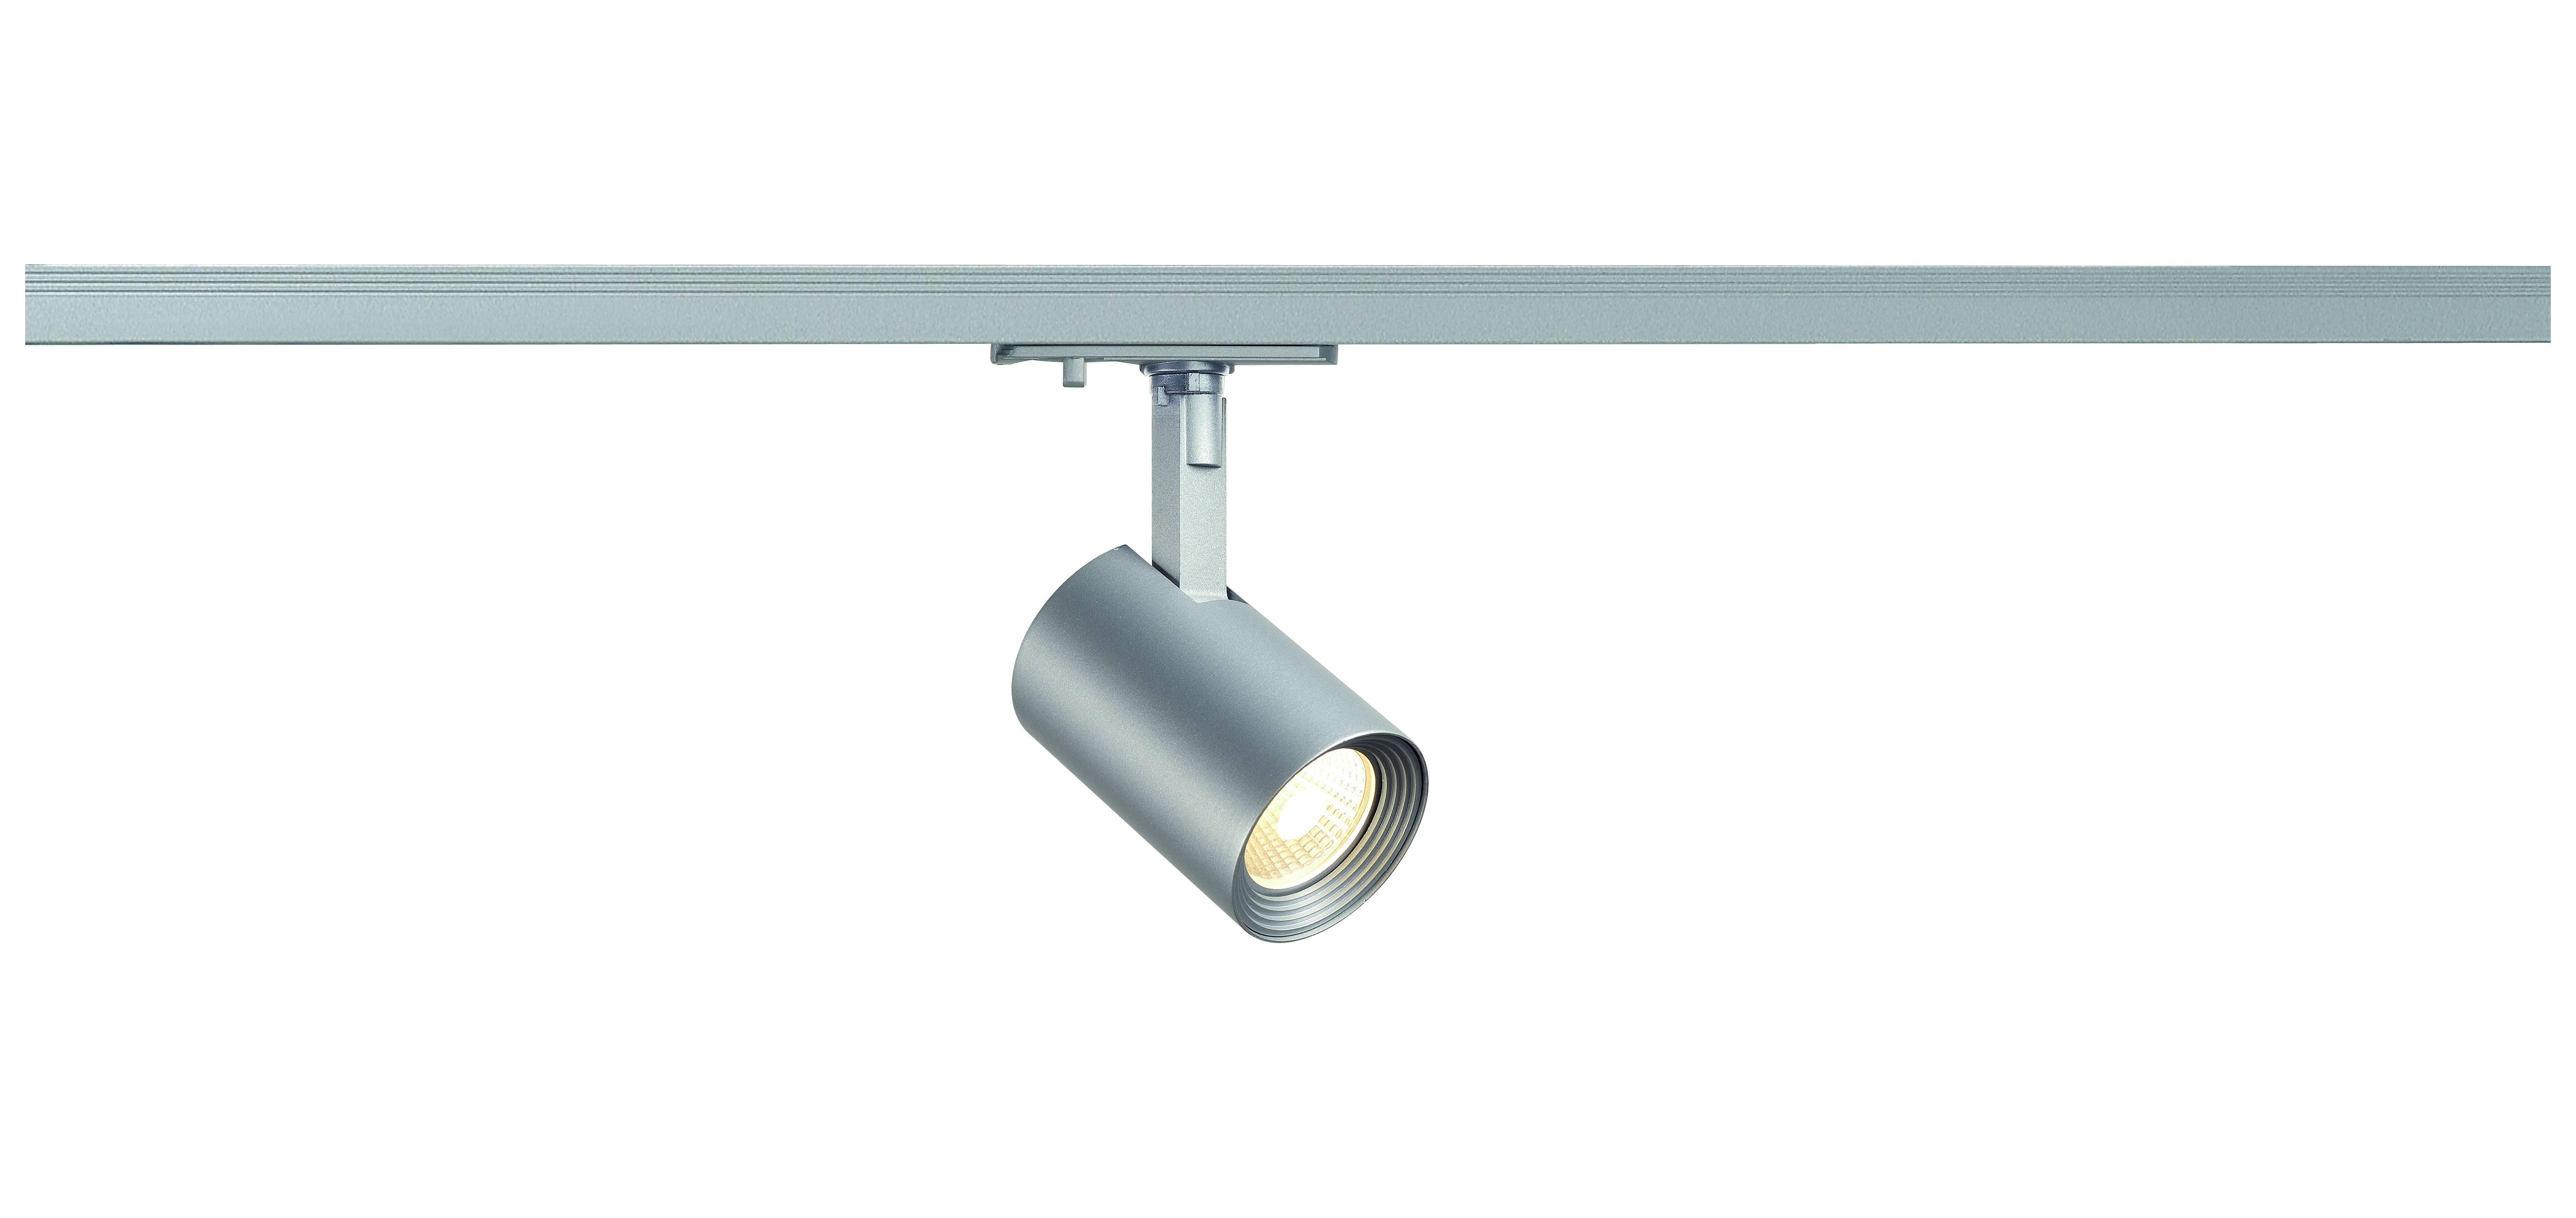 1 Stk Debasto LED Spot, 8W, 3000K, Ra=80, 360lm, rund, silbergrau LI143574--